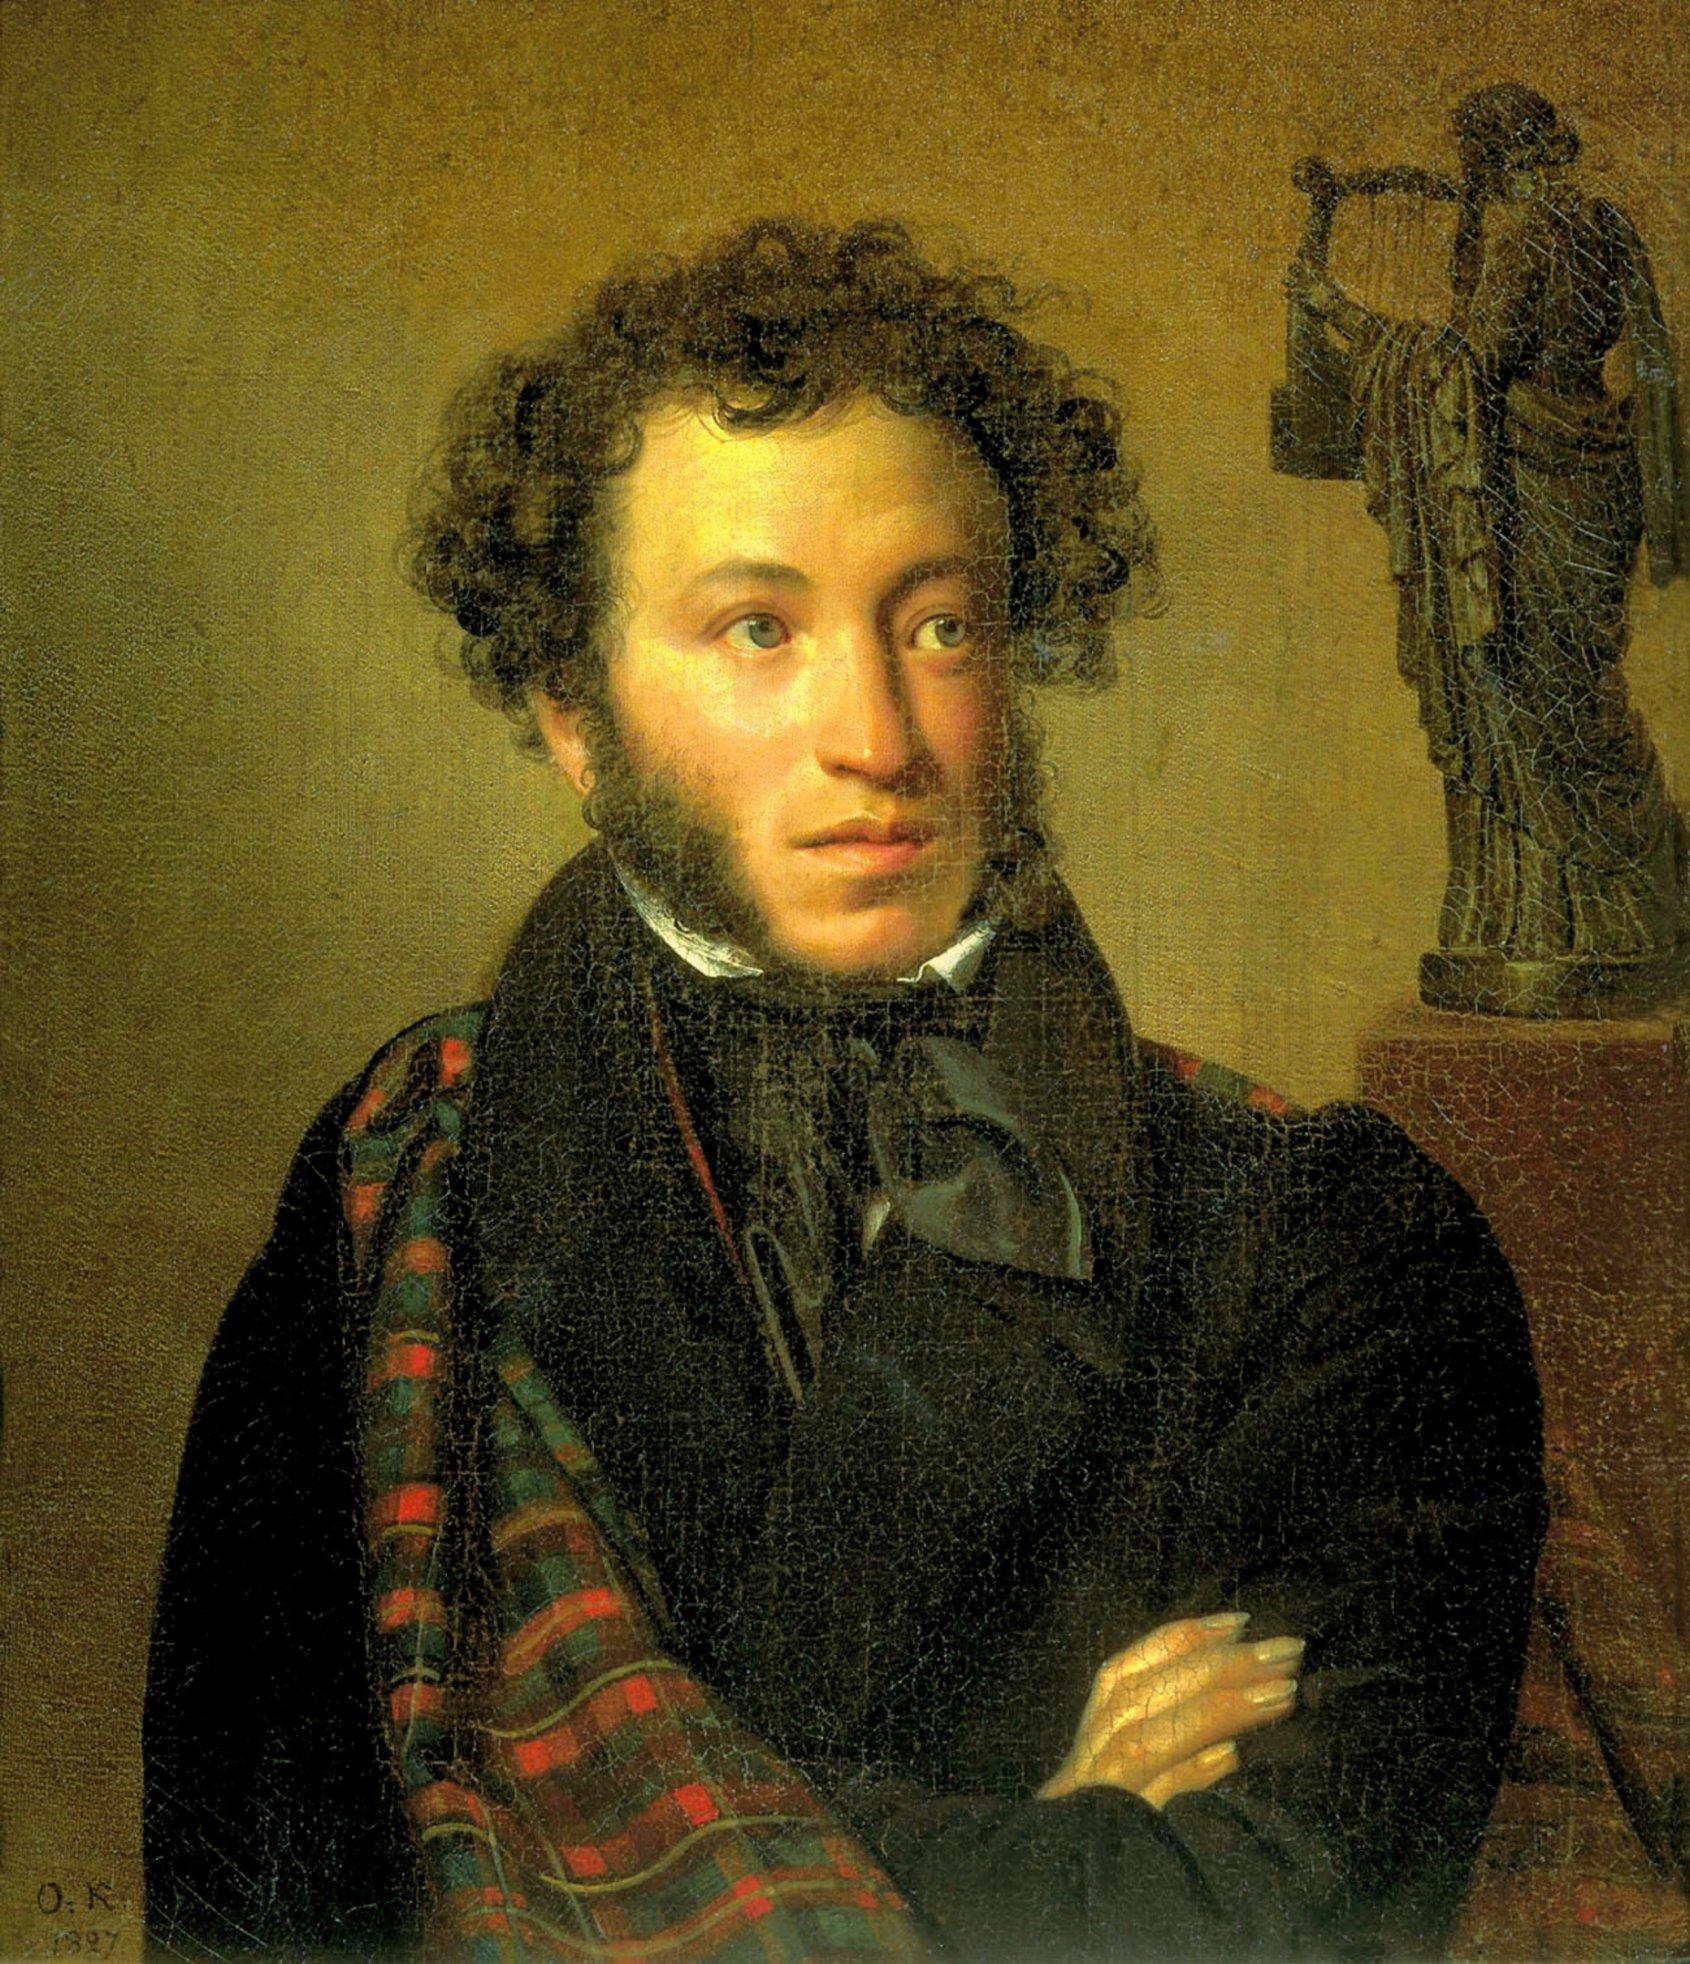 Orest Adamovich Kiprensky [Public domain or Public domain], via Wikimedia Commons